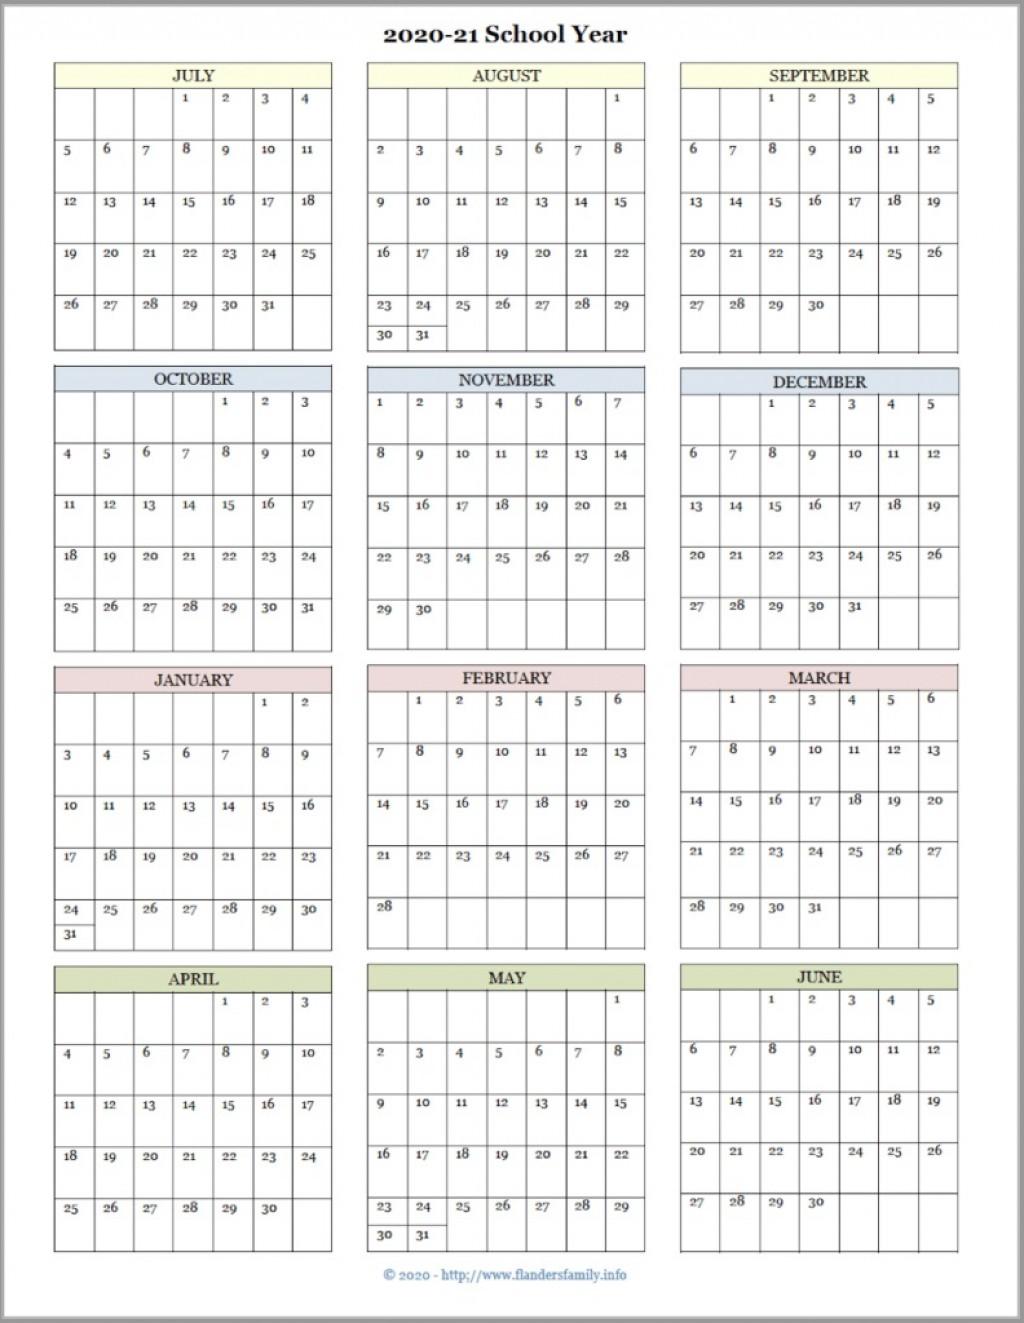 001 Formidable School Year Calendar Template Idea  Excel 2019-20 WordLarge